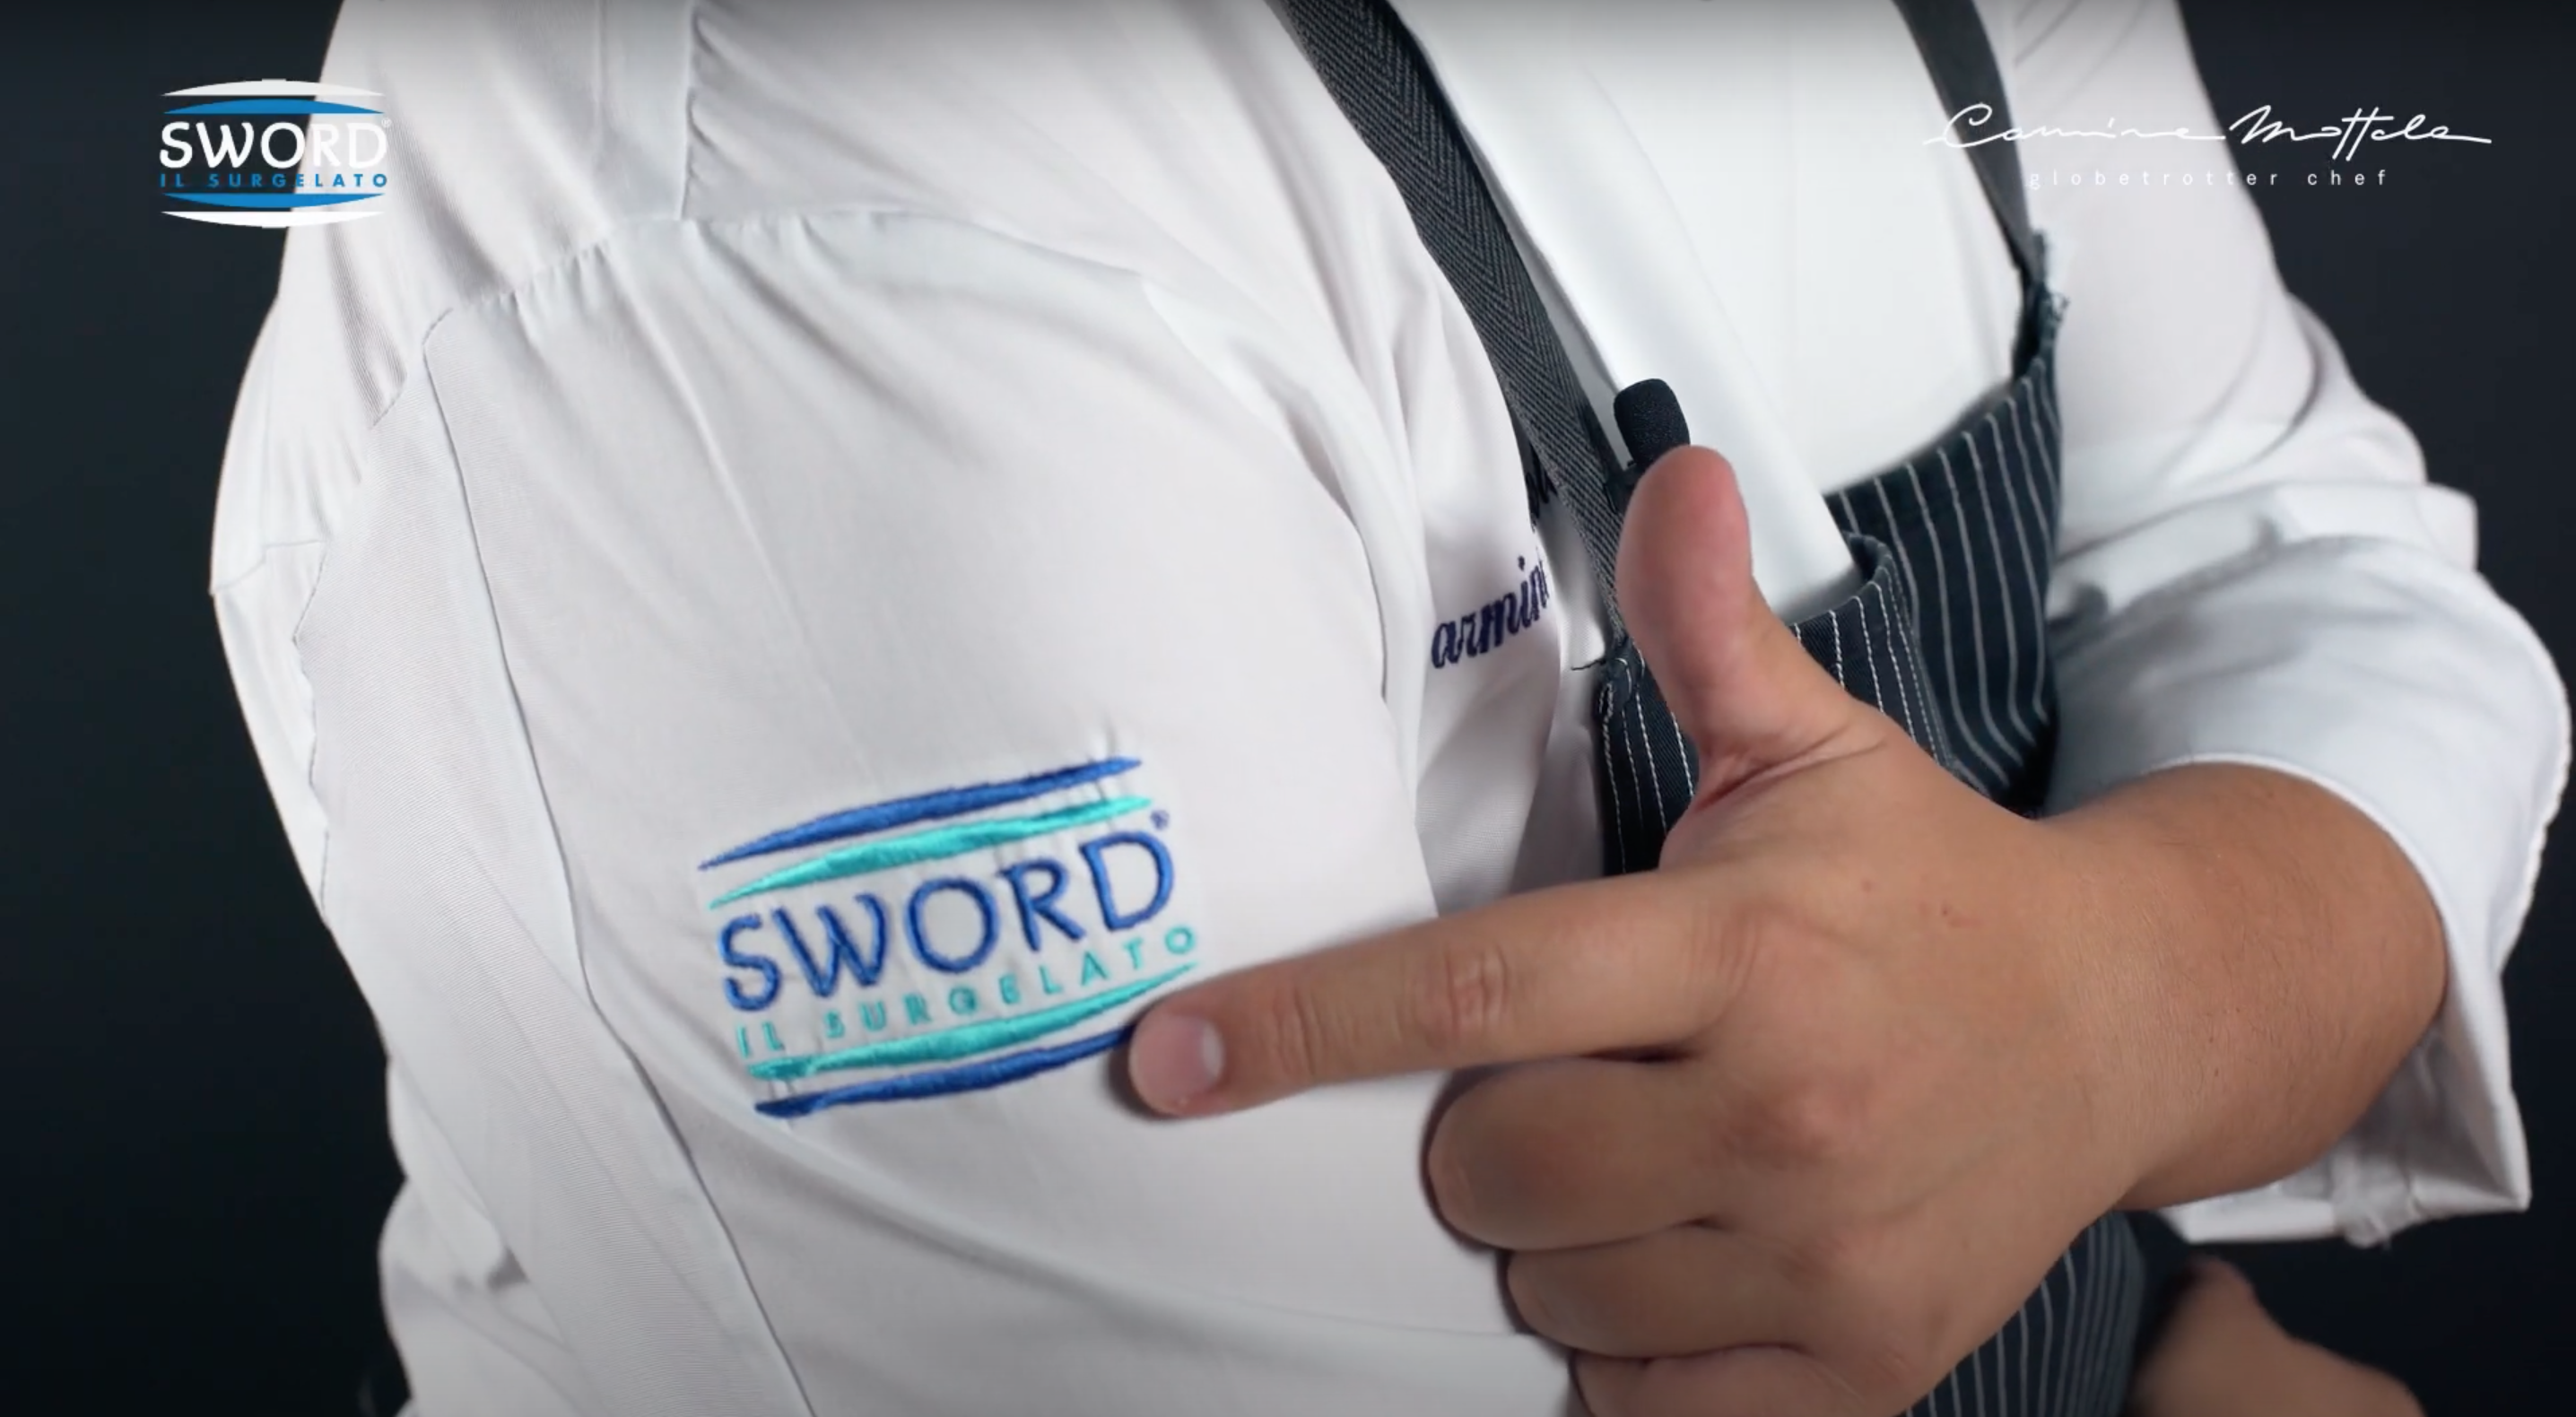 Sword-surgelati-globe-trotter-chef-carmine-mottola